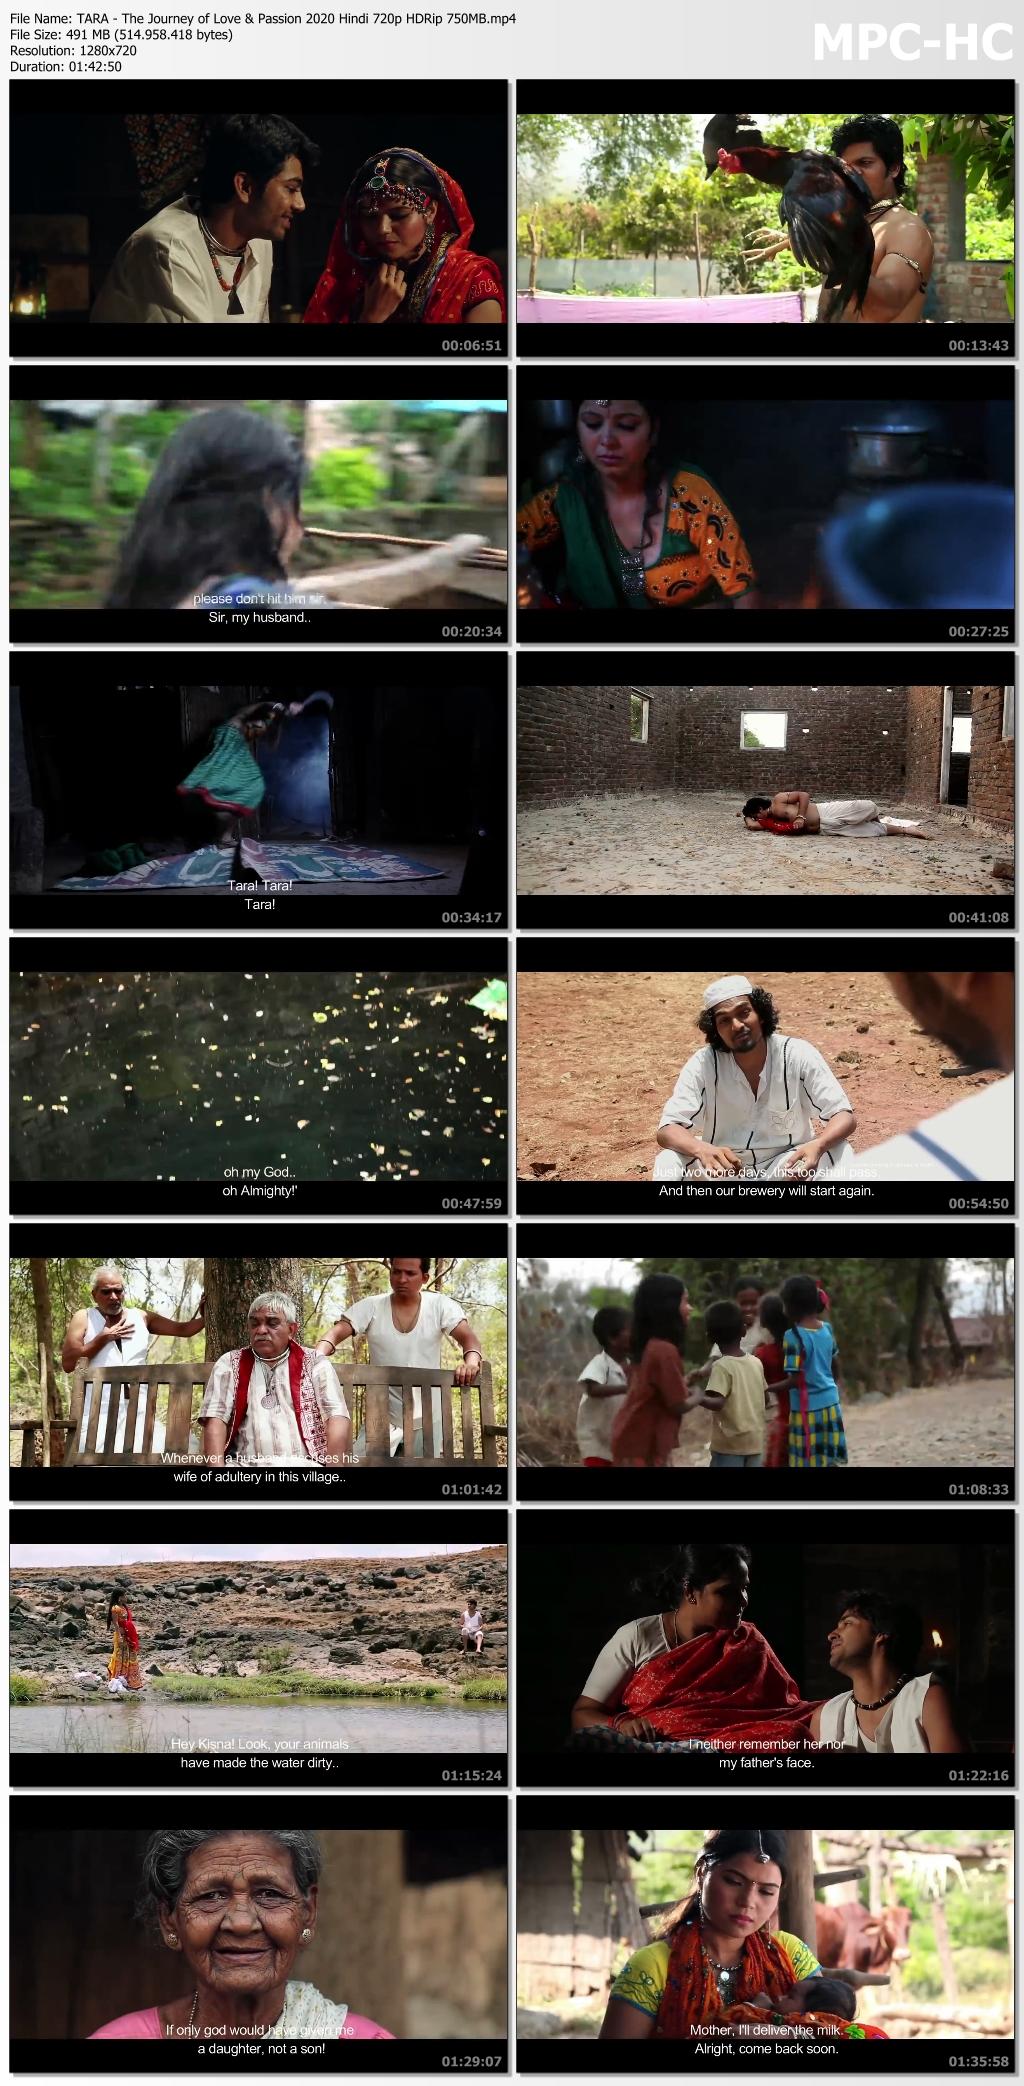 TARA-The-Journey-of-Love-Passion-2020-Hindi-720p-HDRip-750-MB-mp4-thumbs